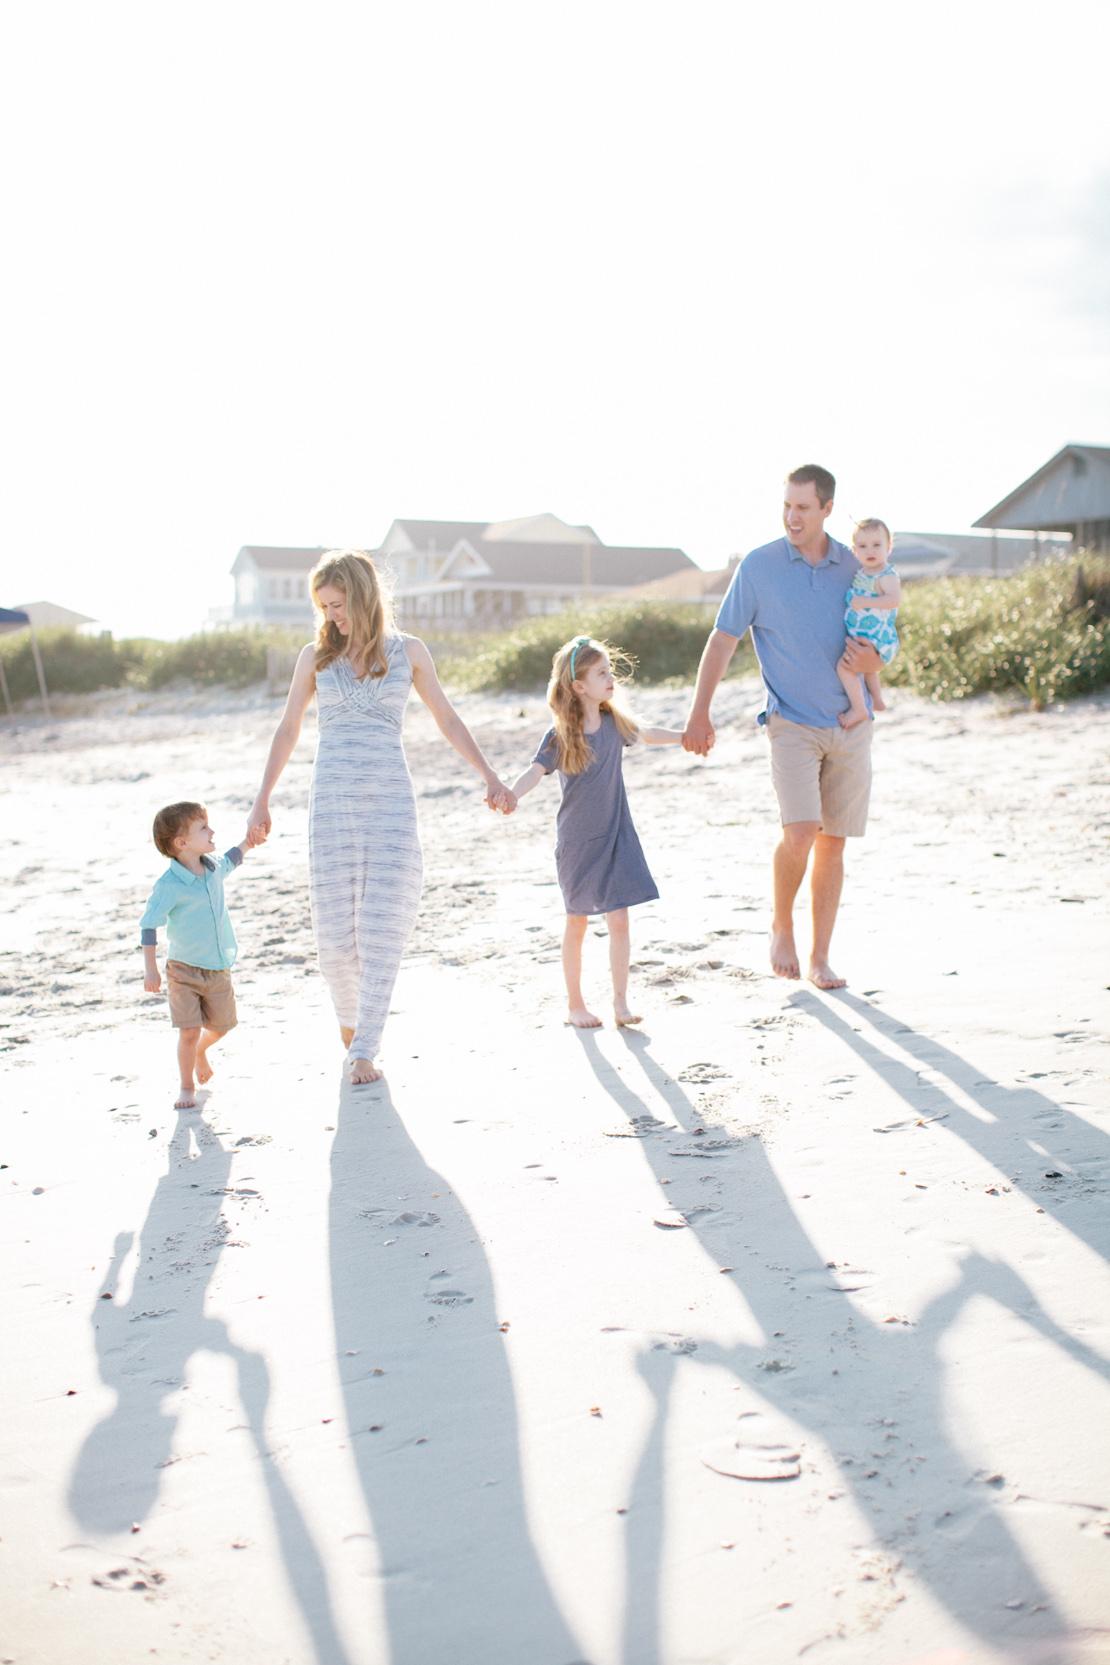 Adams-Family-Holden-Beach_Grain-and-Compass-47.jpg